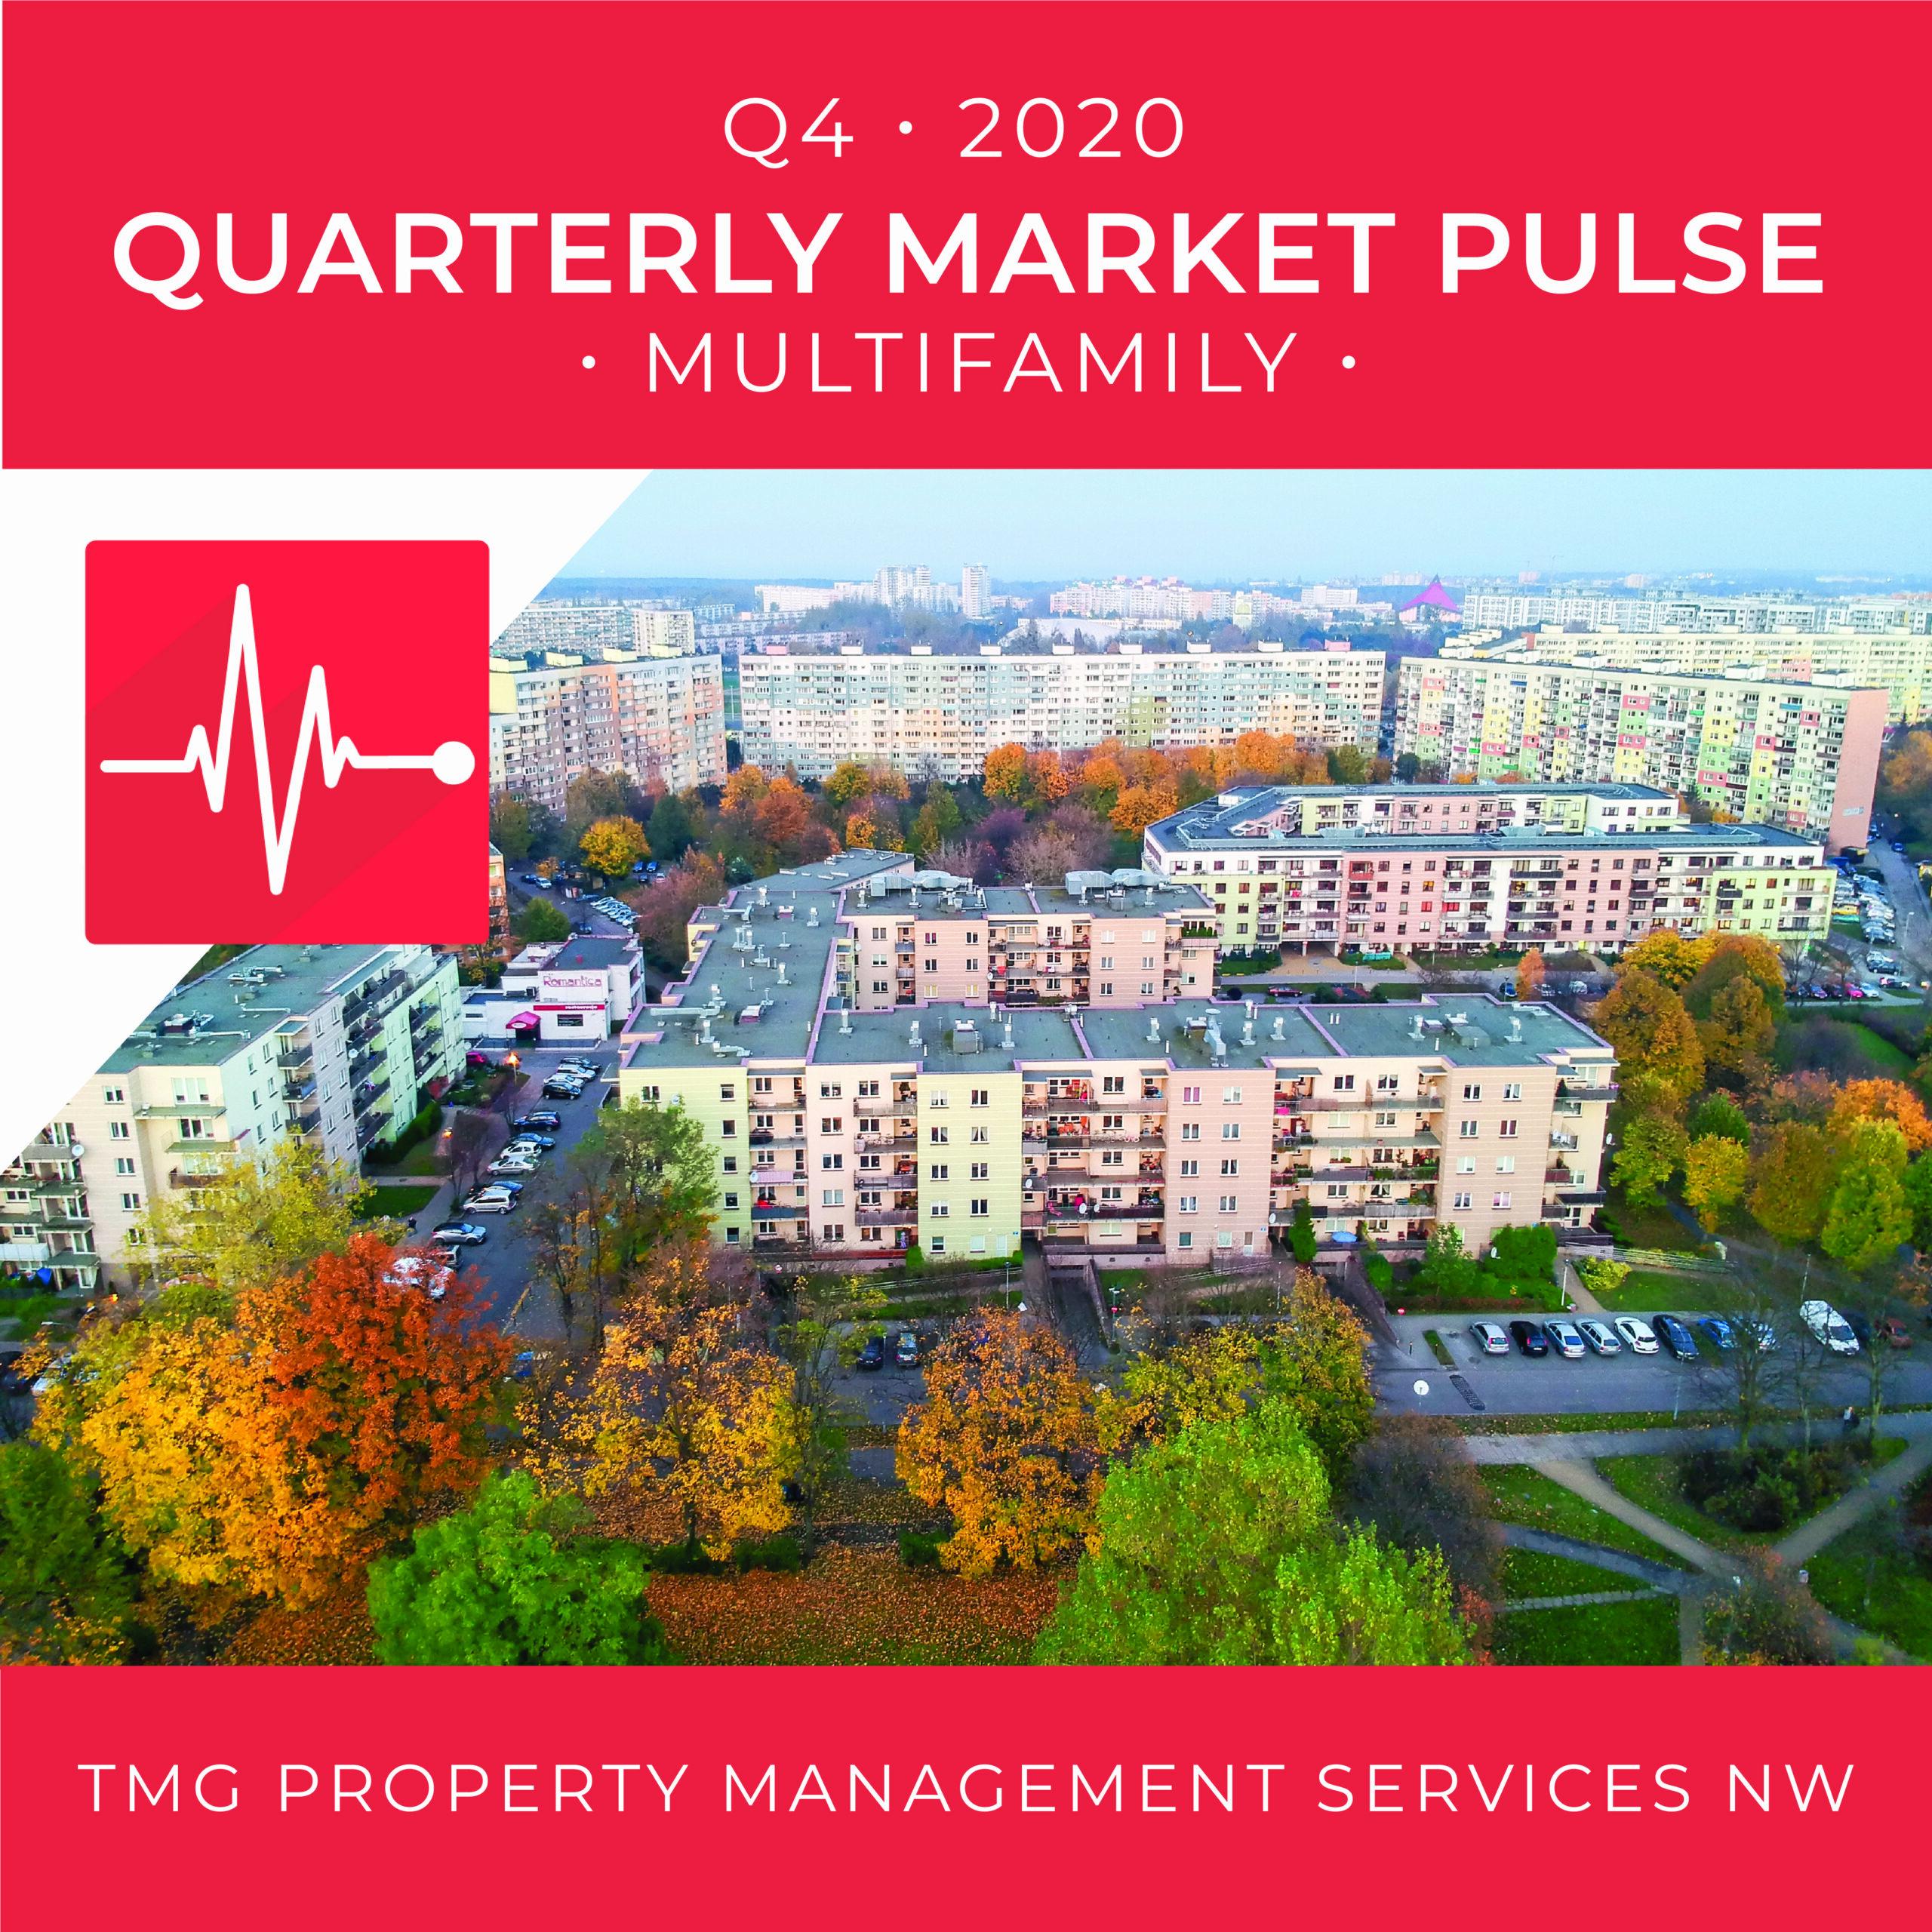 Quarterly Market Pulse Q4 2020